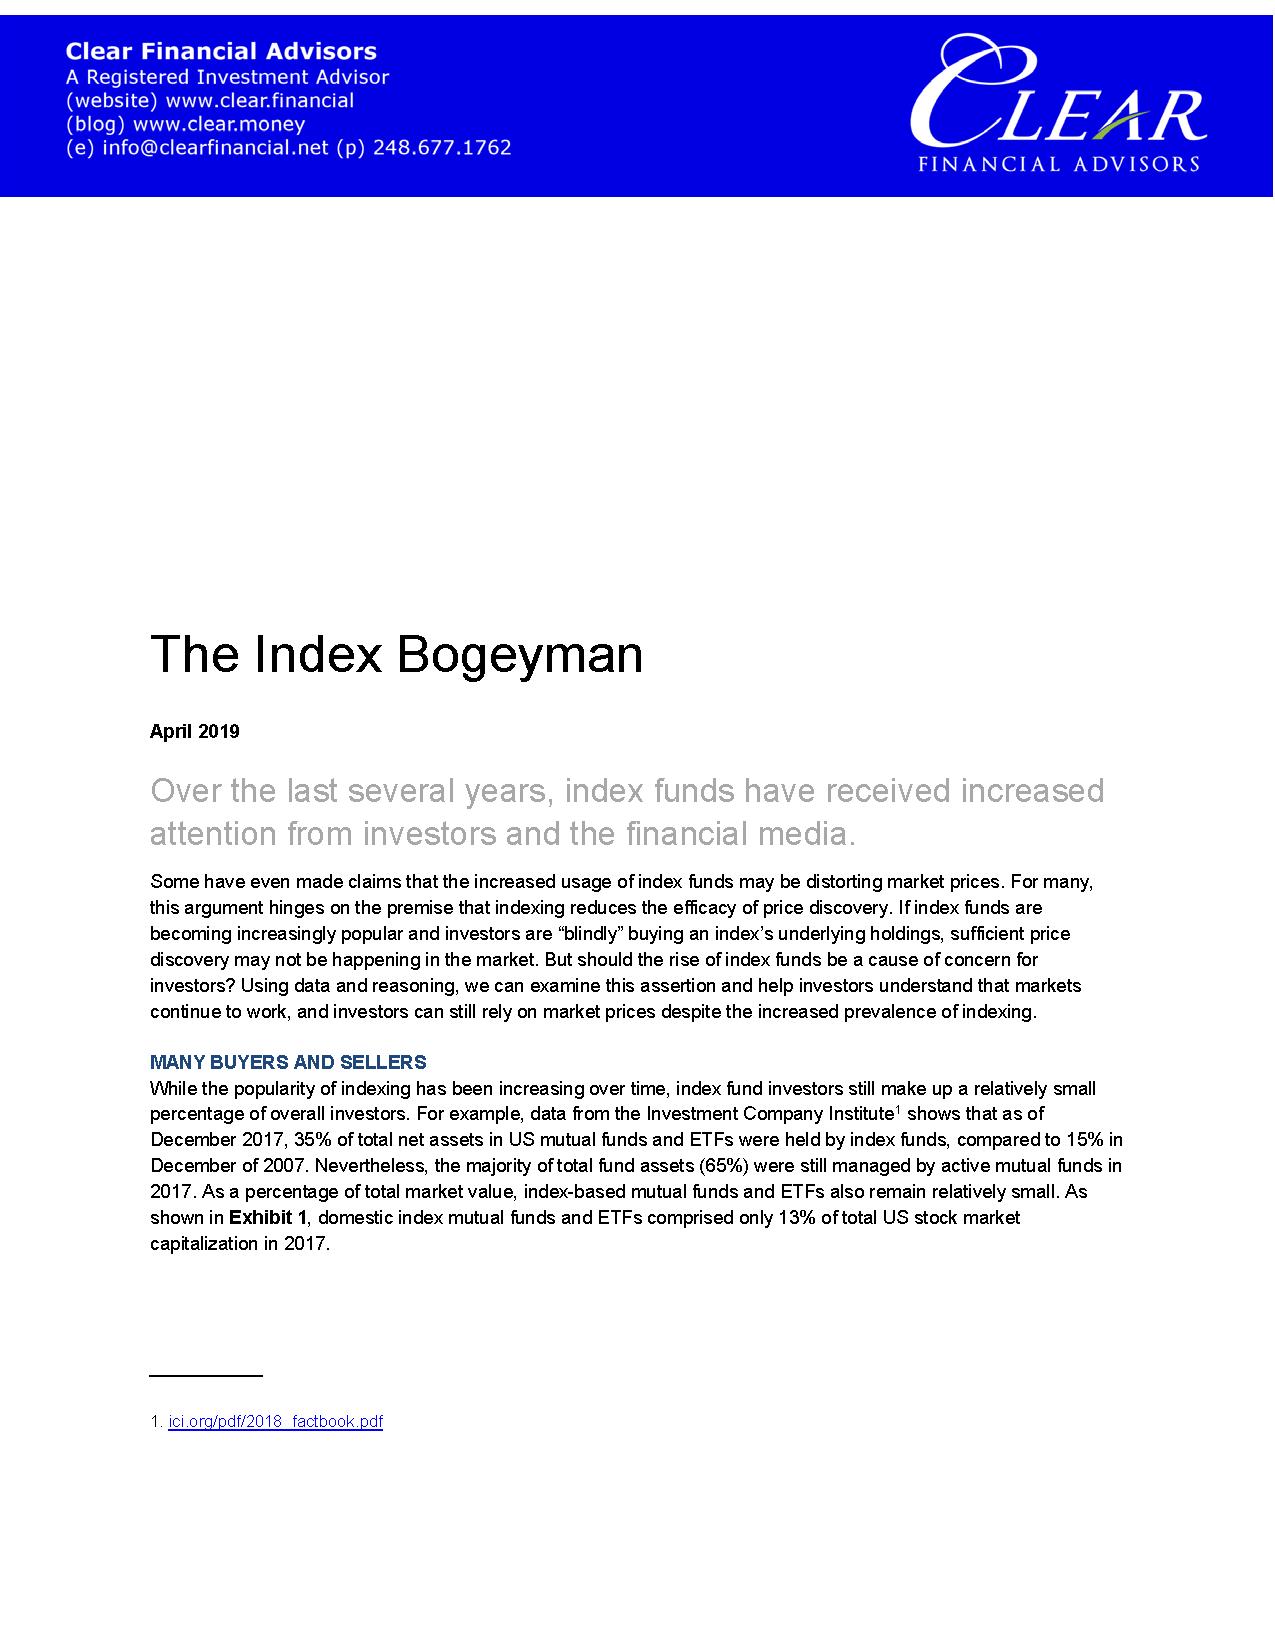 201904 The Index Bogeyman_Page_1